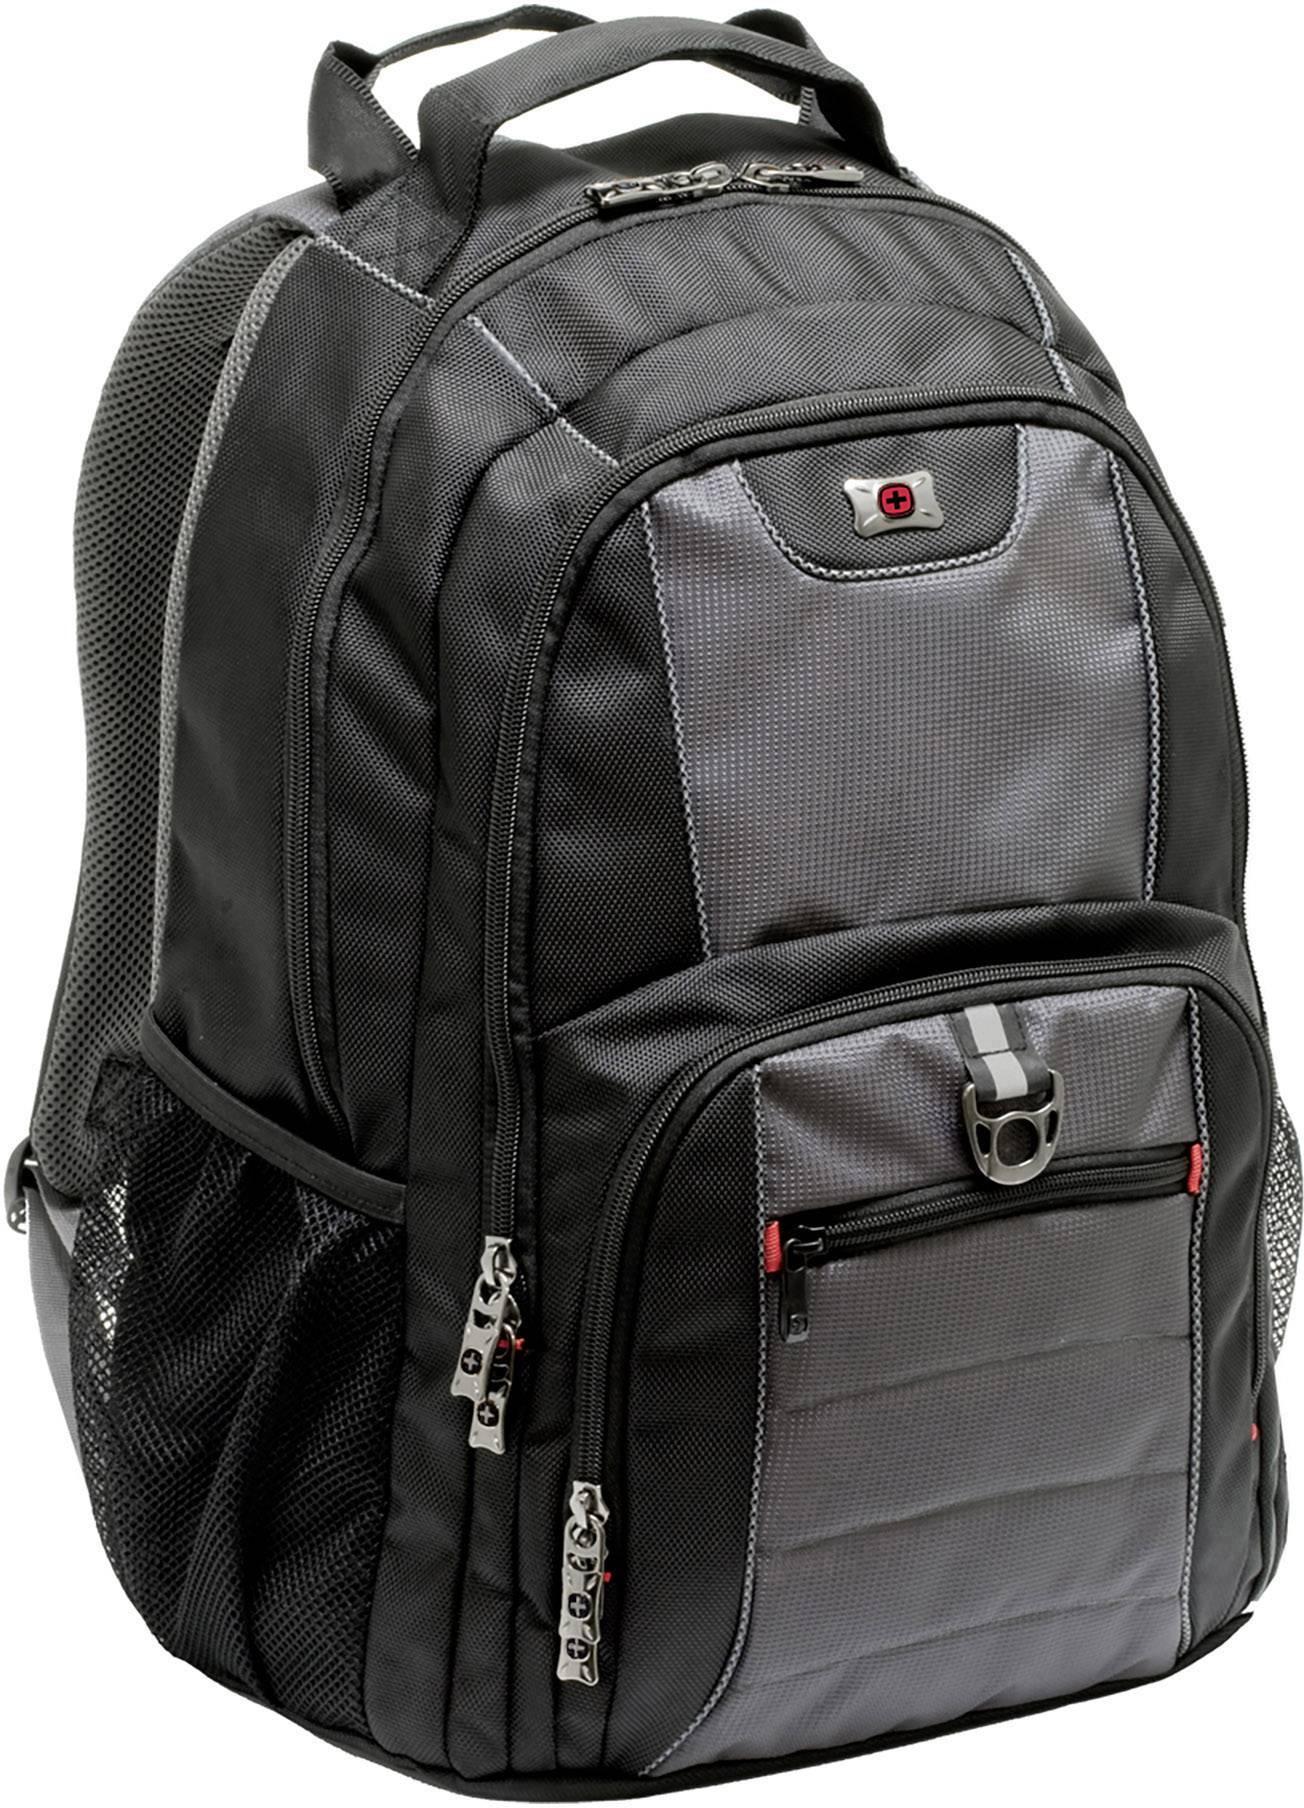 c6a0871c8669c Wenger 15 Laptop Backpack | Building Materials Bargain Center